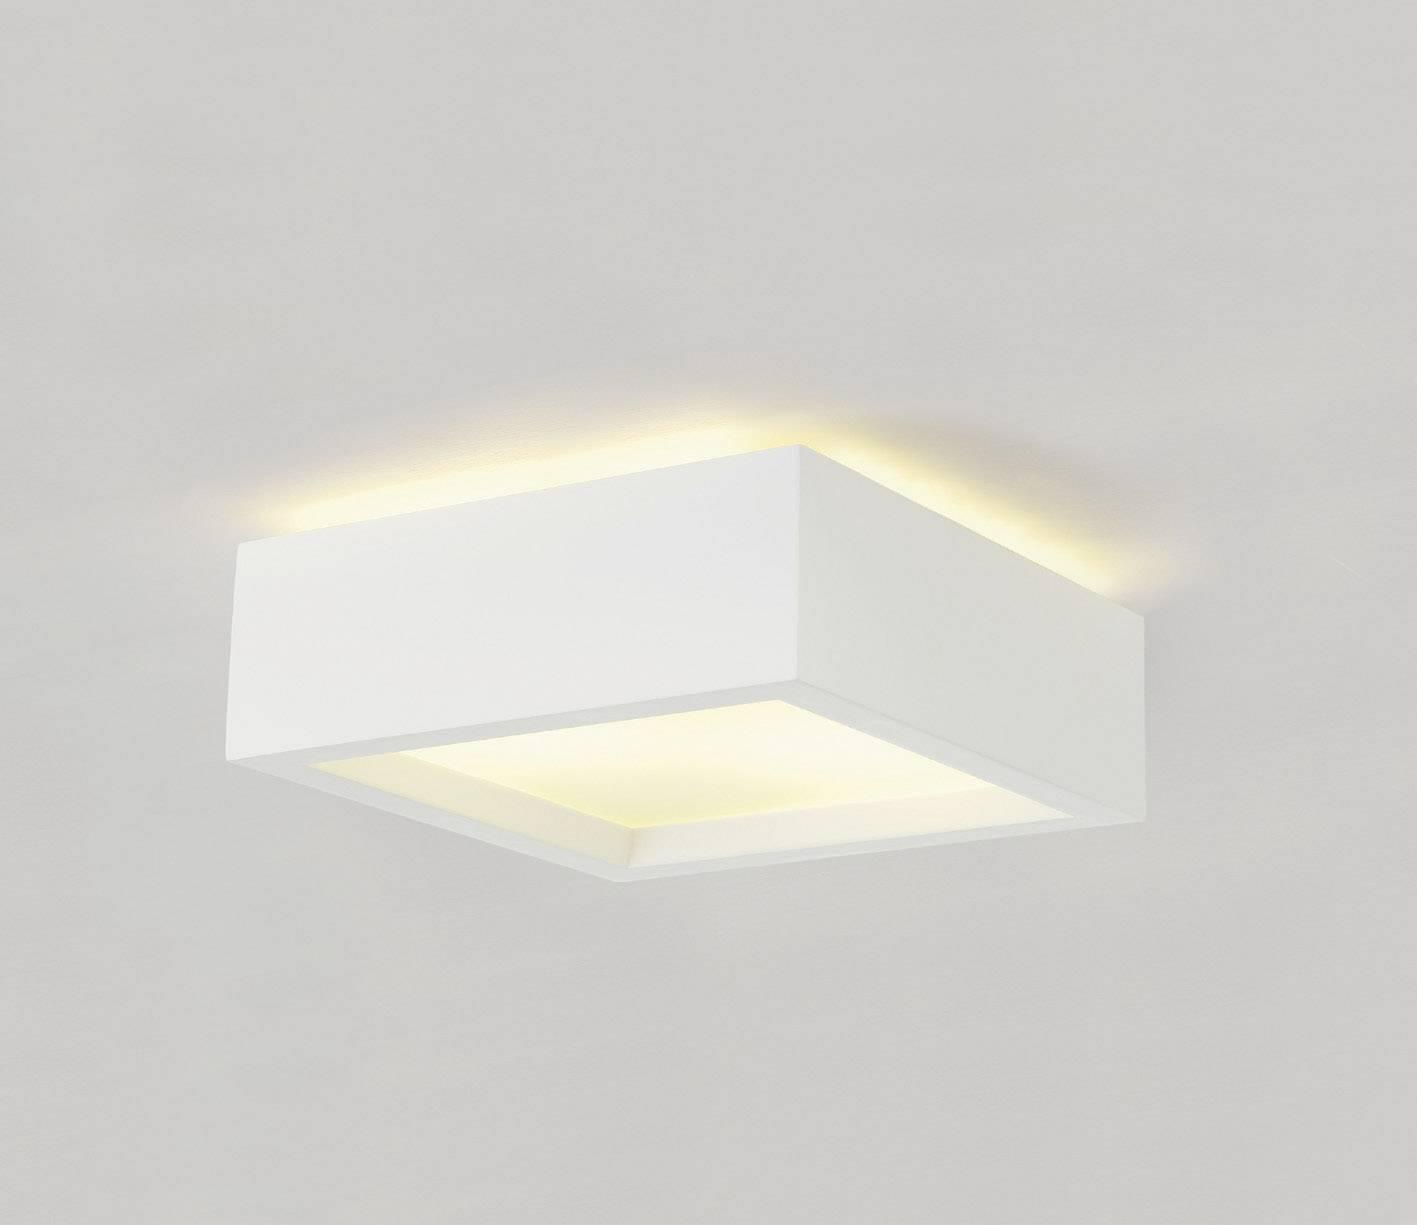 Stropní svítidlo úsporná žárovka SLV GL105 148002, E27, 50 W, bílá